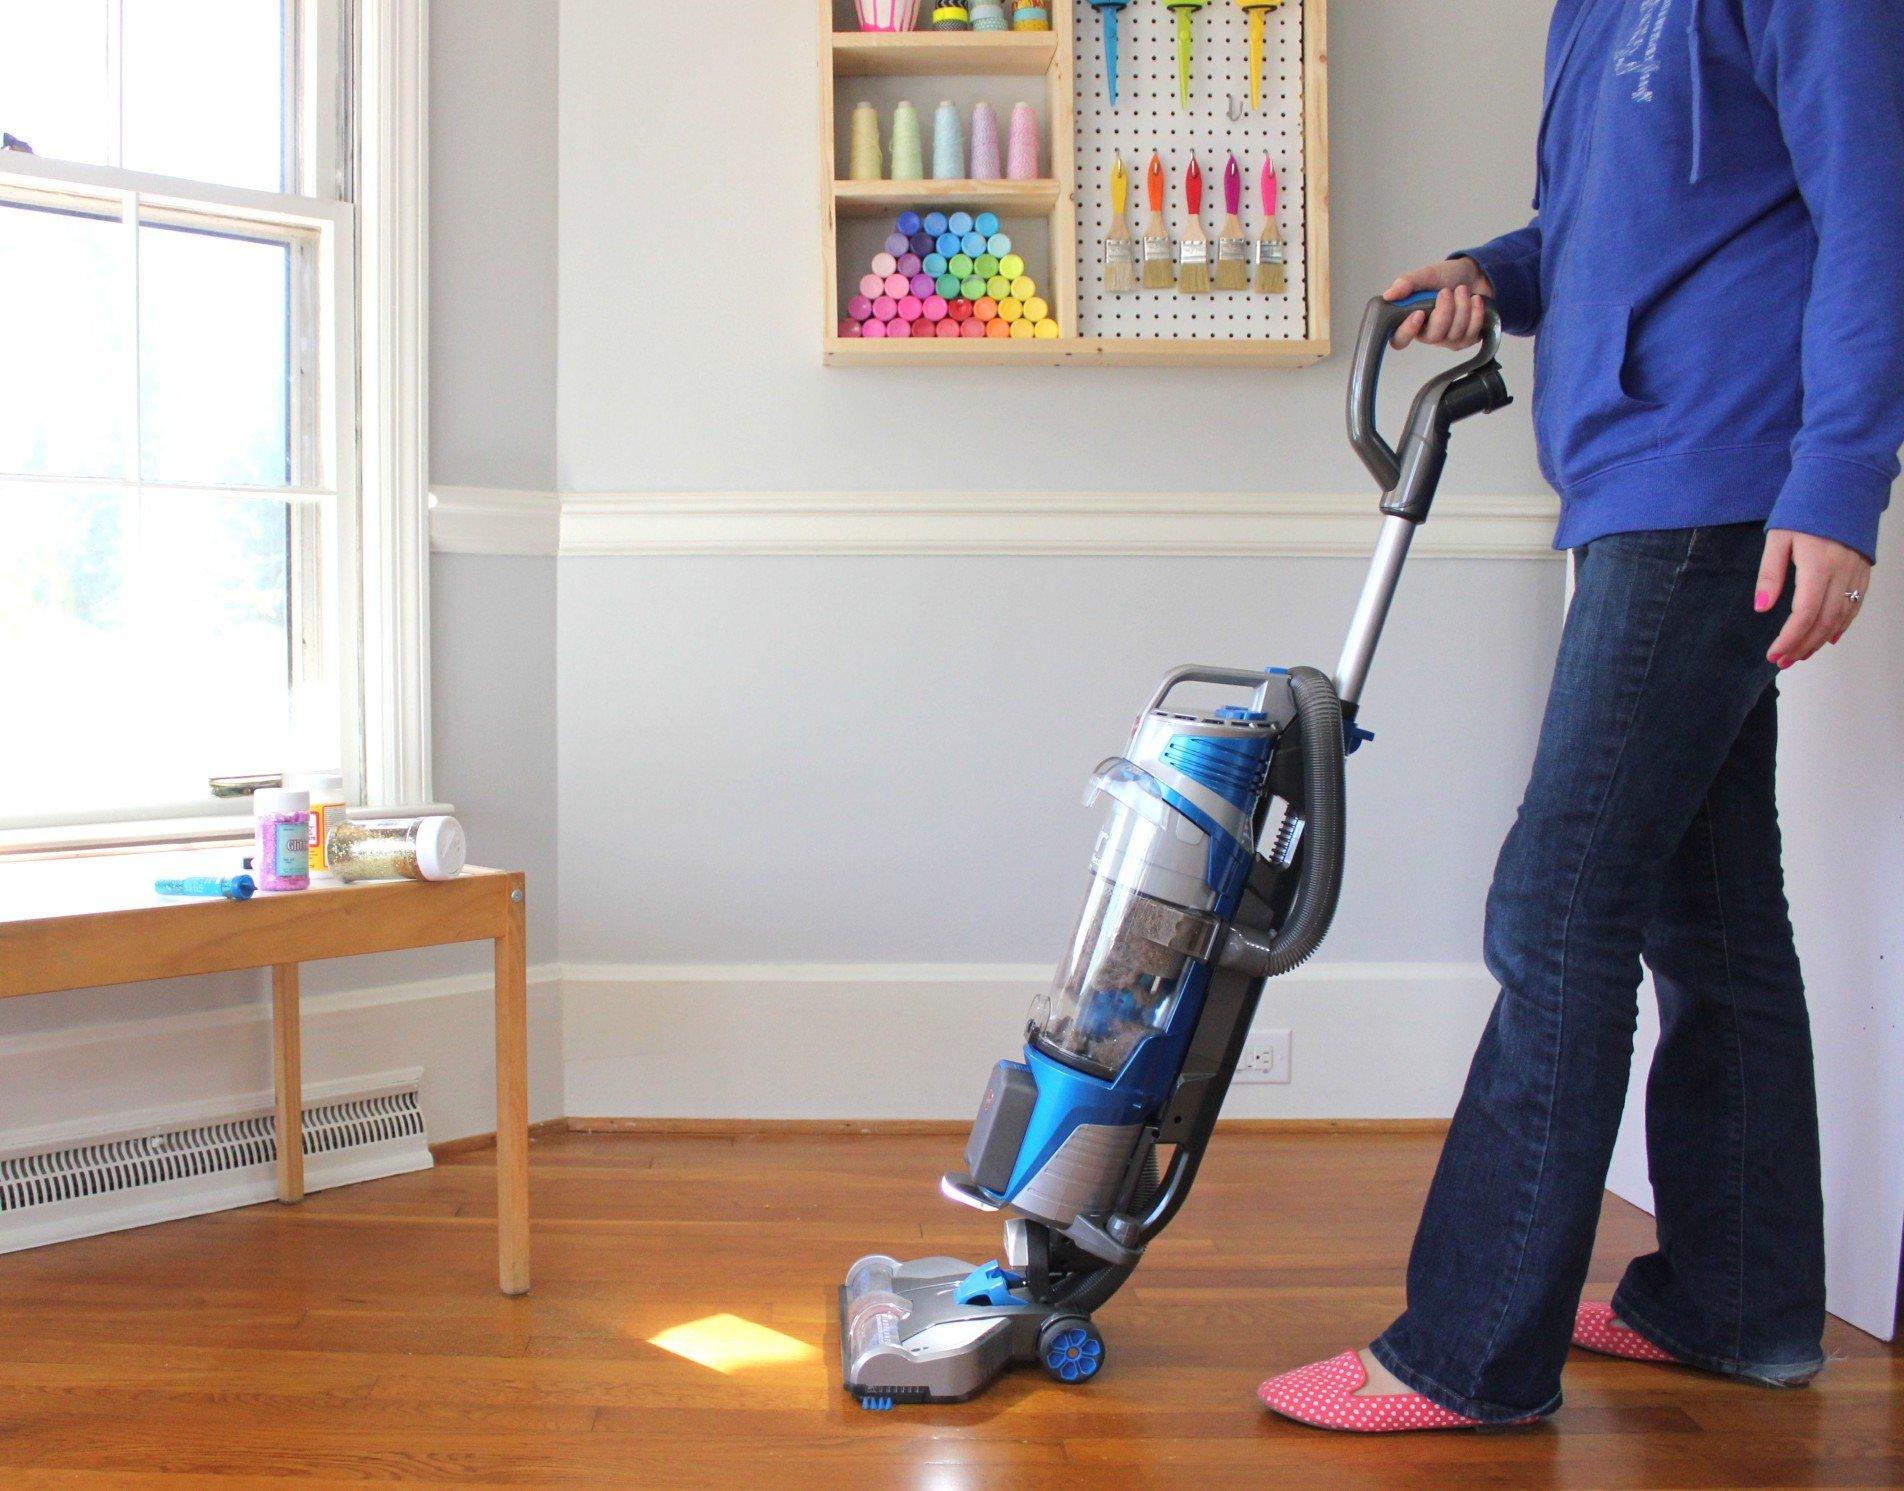 Vacuum Cleaner Preventive Maintenance Checklist